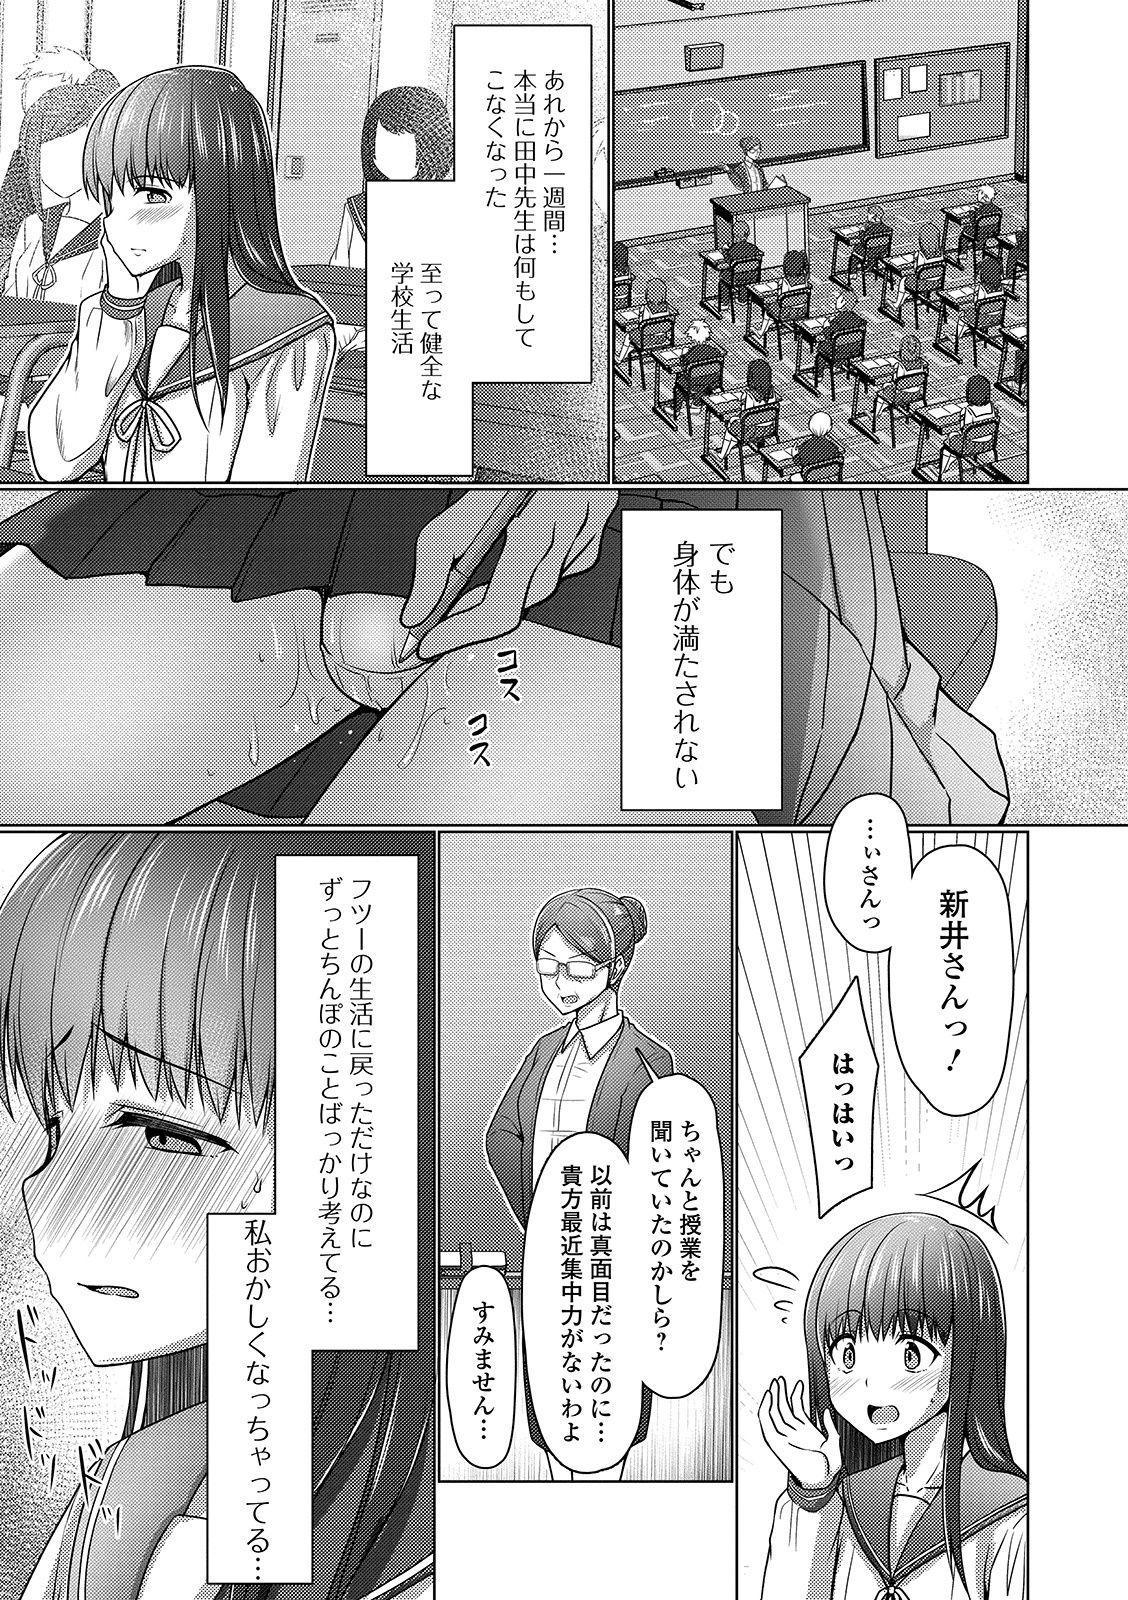 Gekkan Web Otoko no Ko-llection! S Vol. 43 52